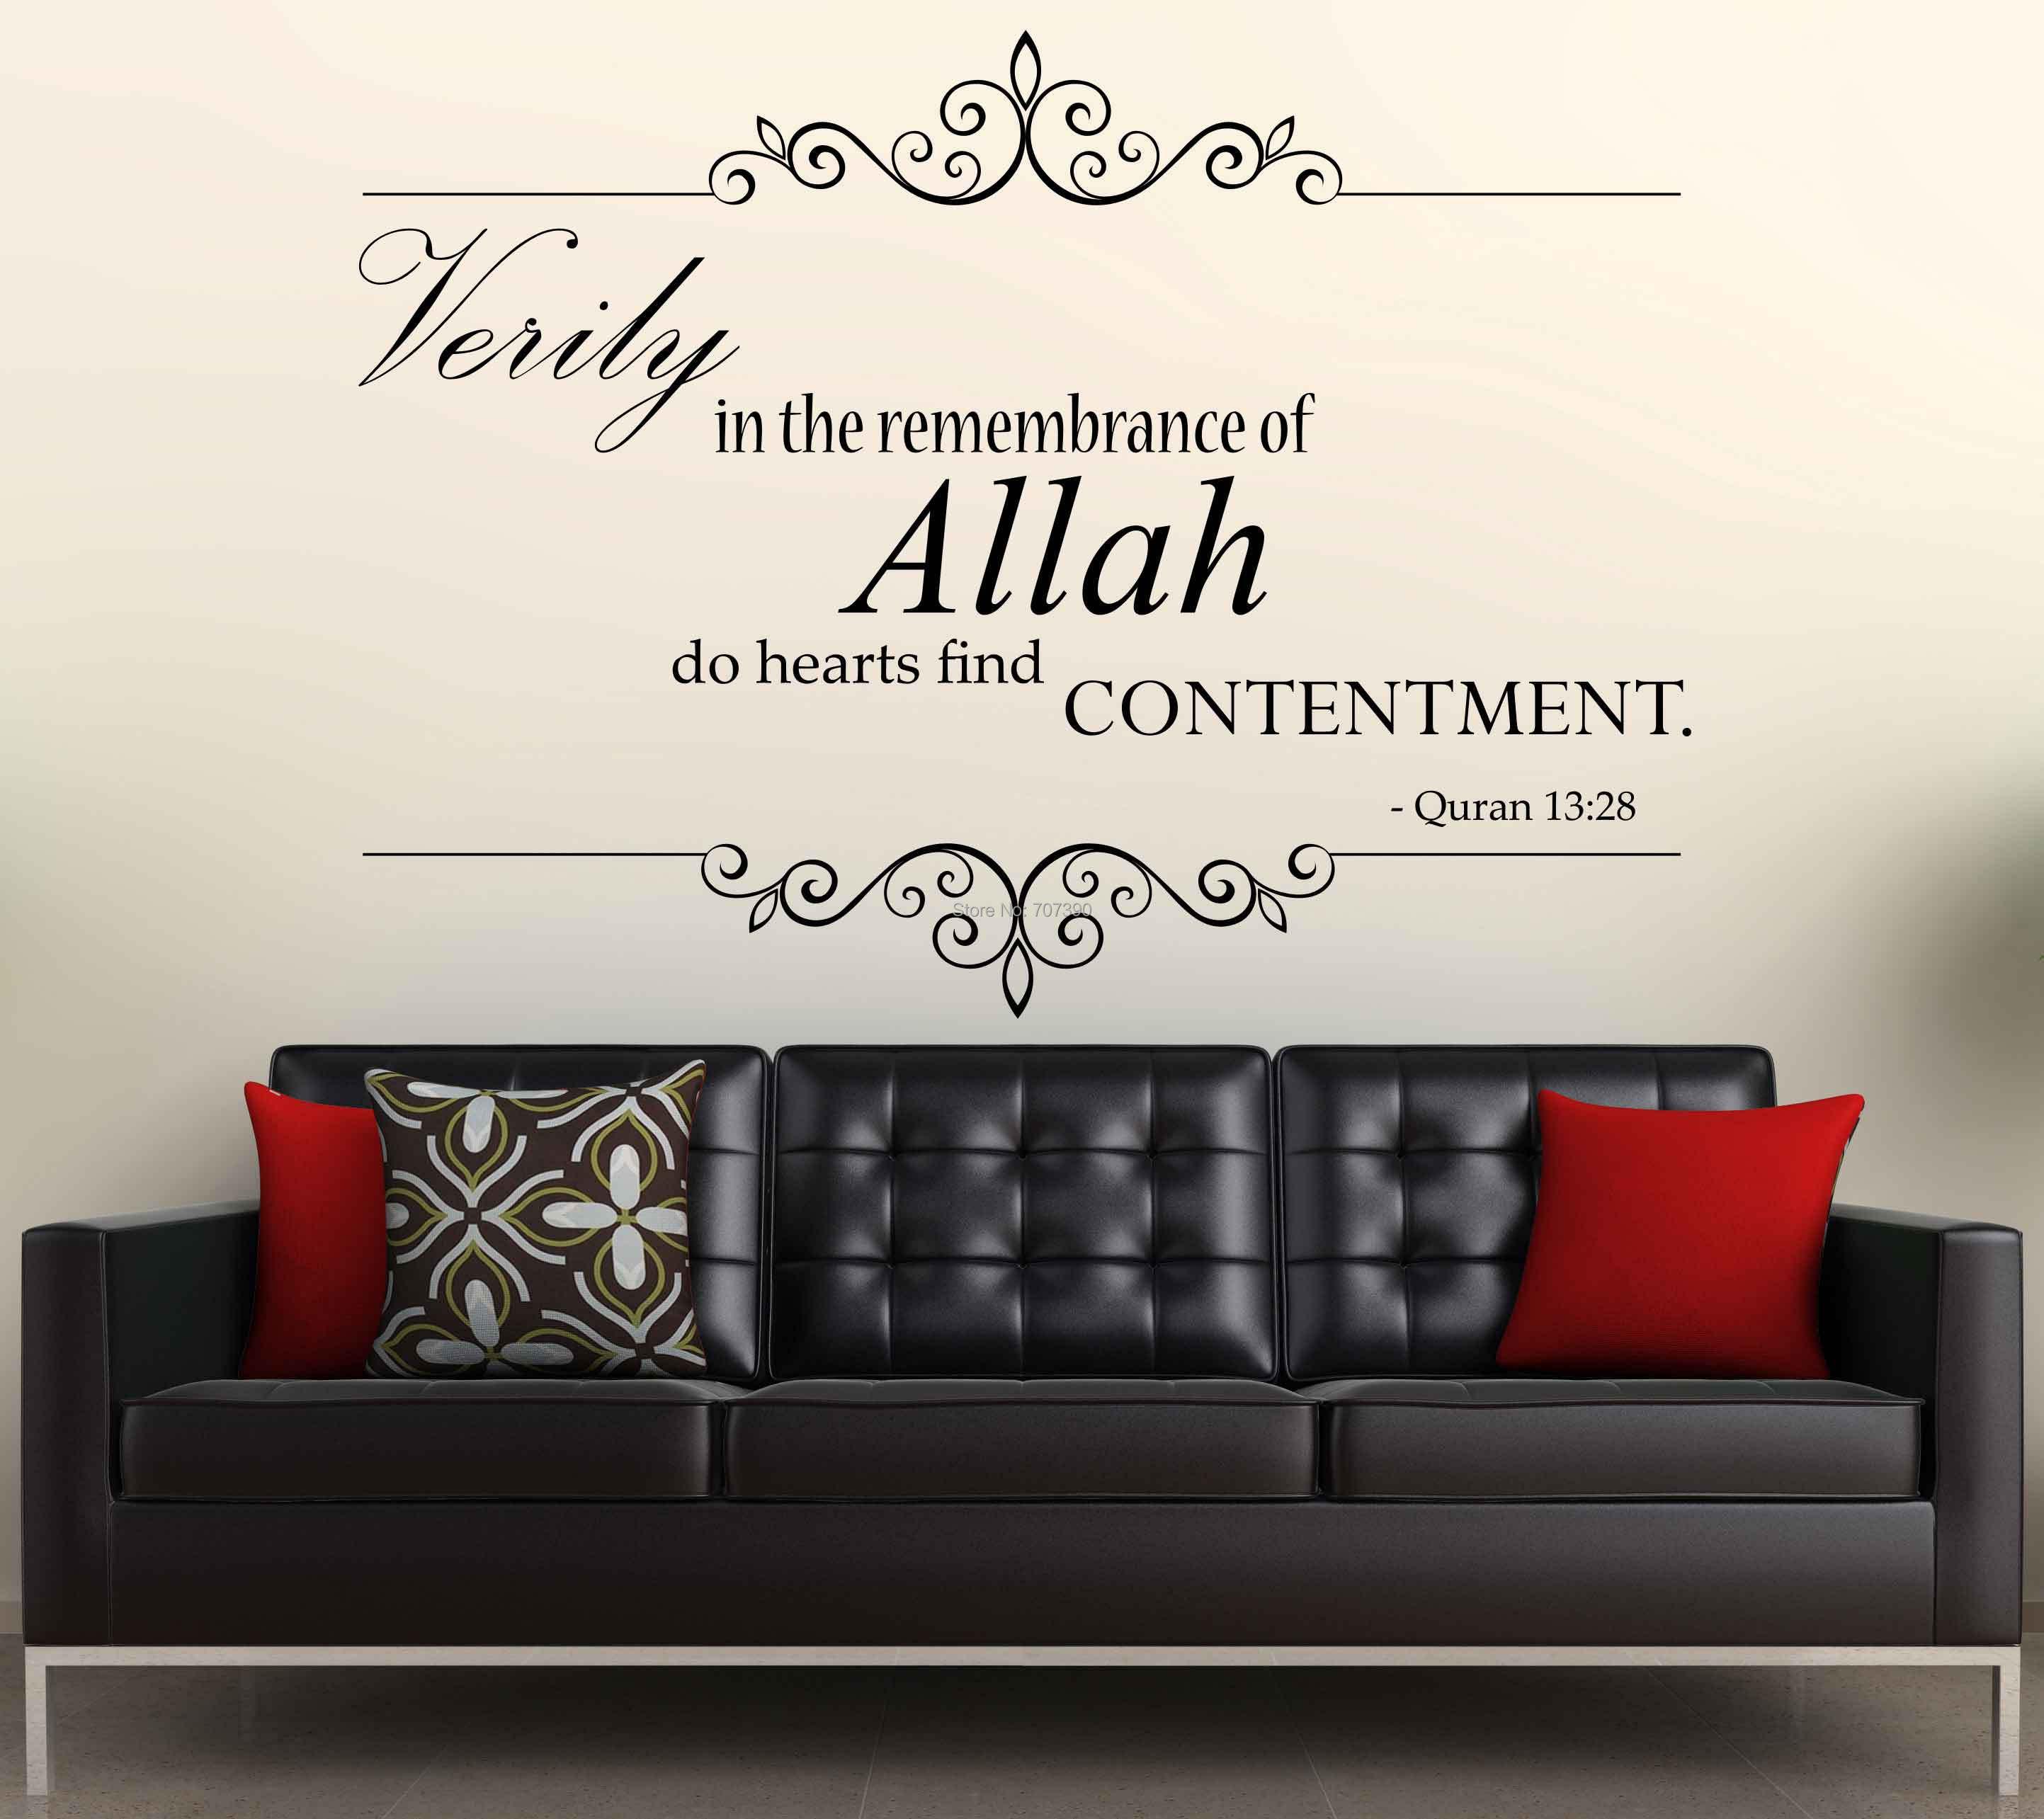 customized allah wall sticker home decor art vinyl muslim decal islamic design no126 75100cm